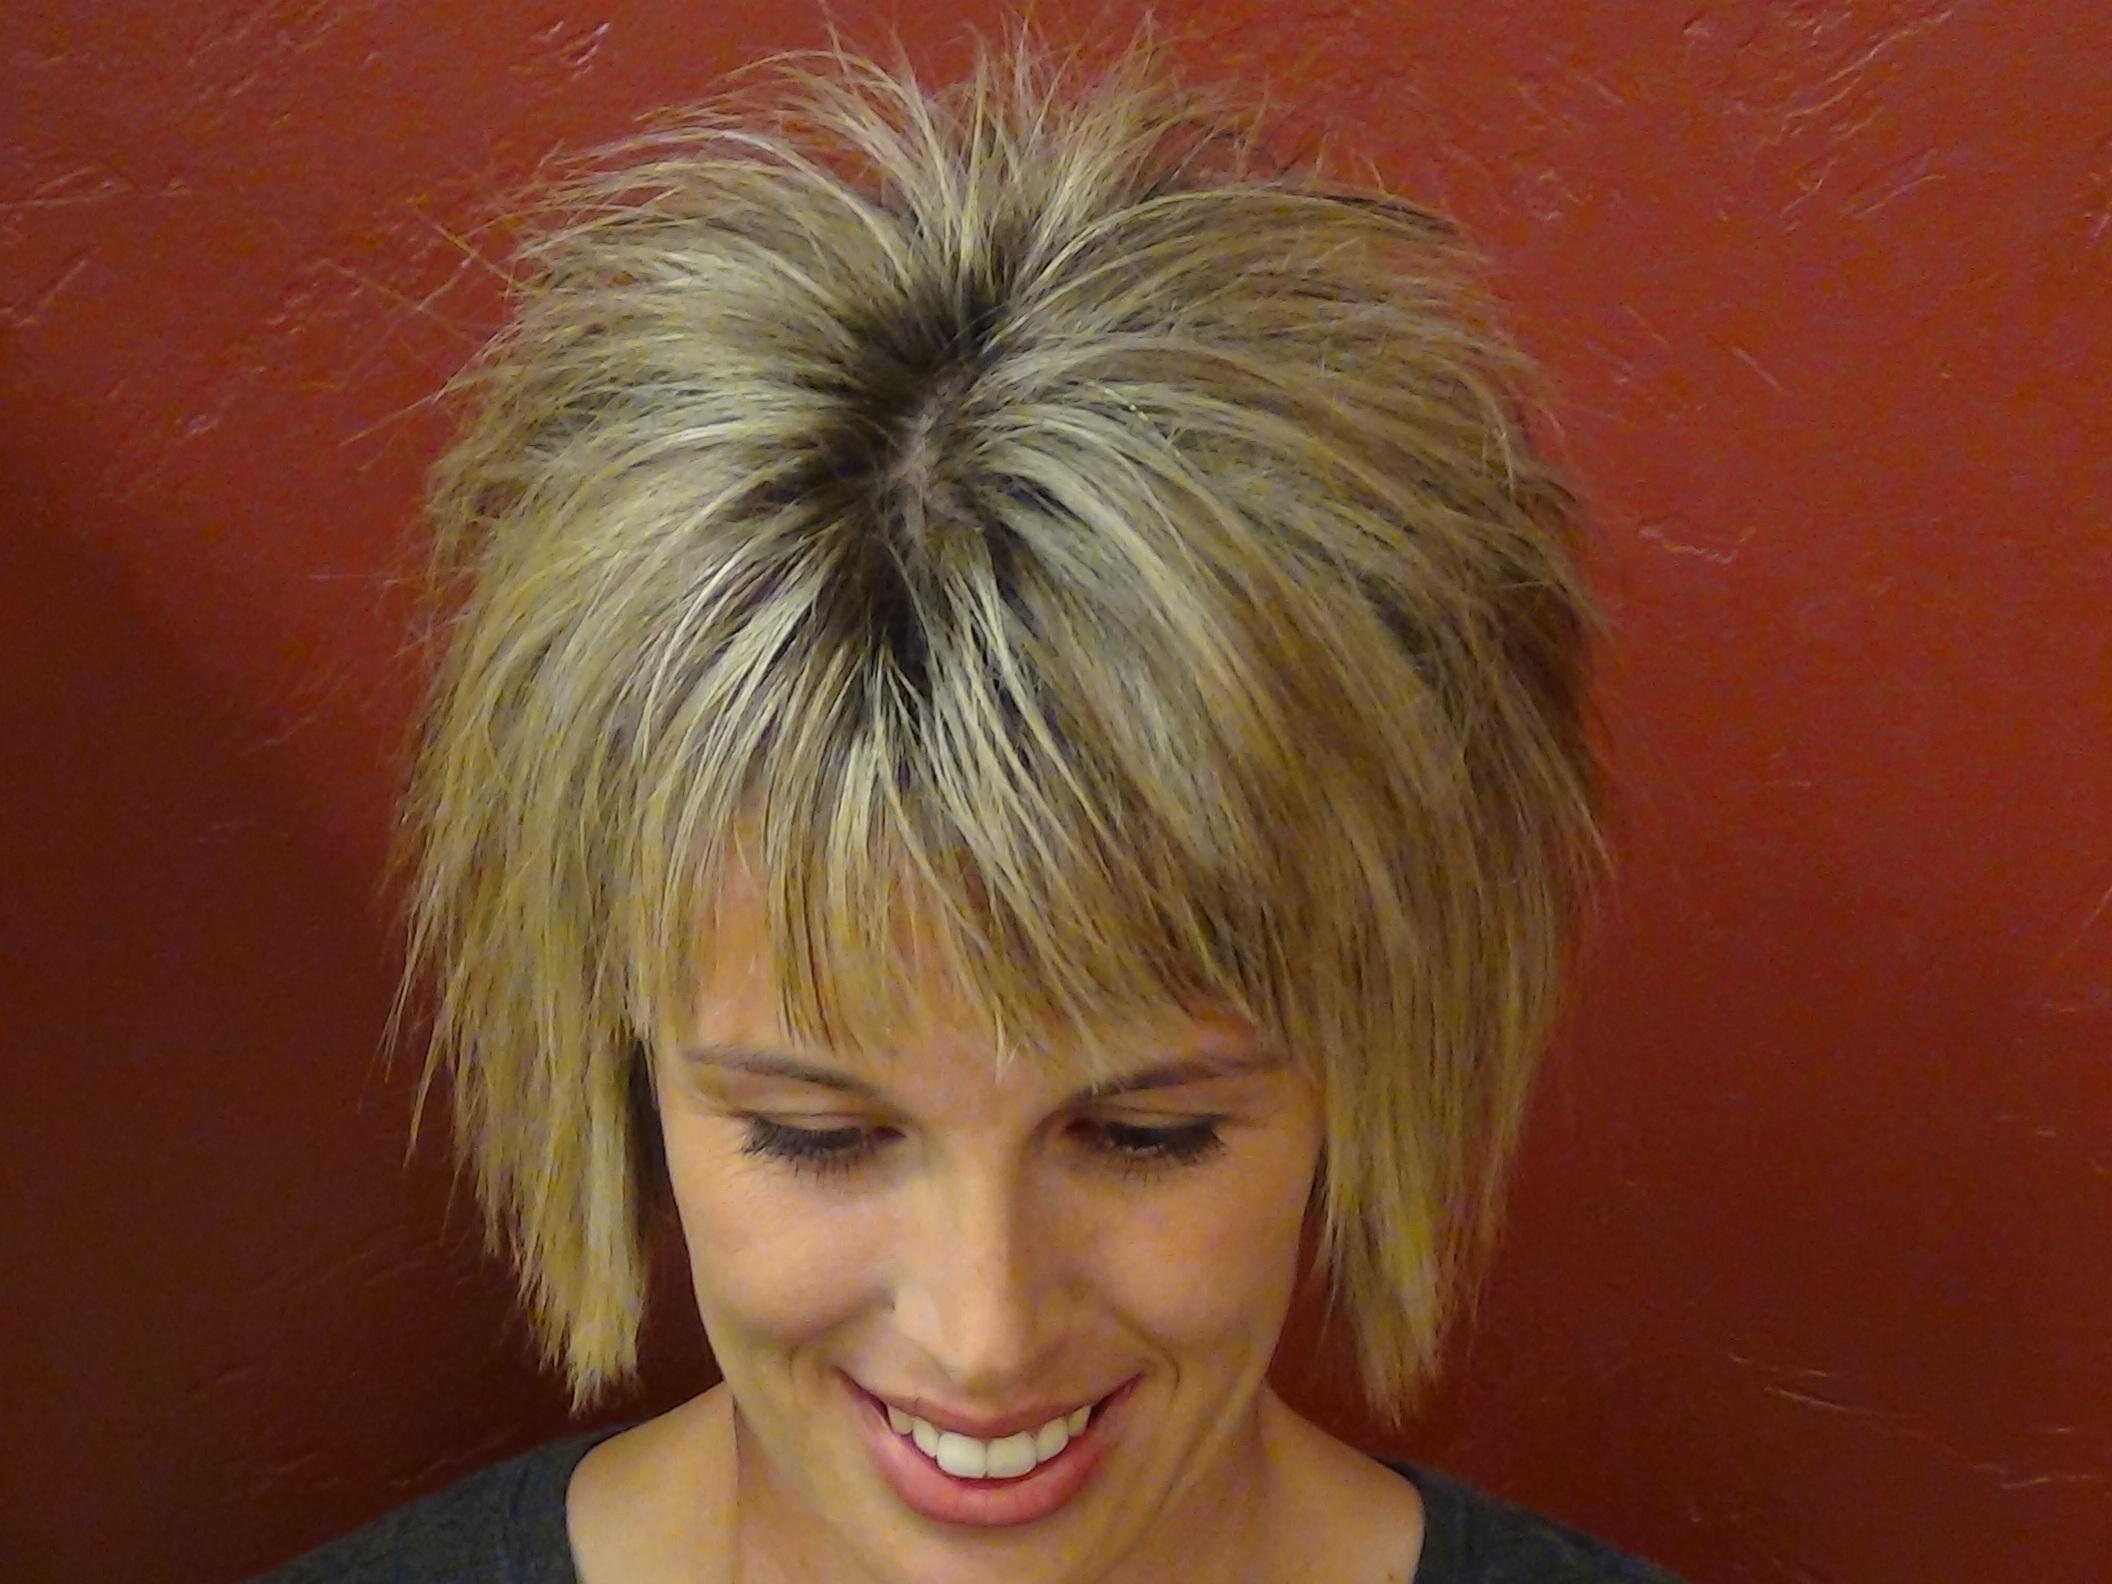 Boys And Girls Hairstyles - Hair Tutorials